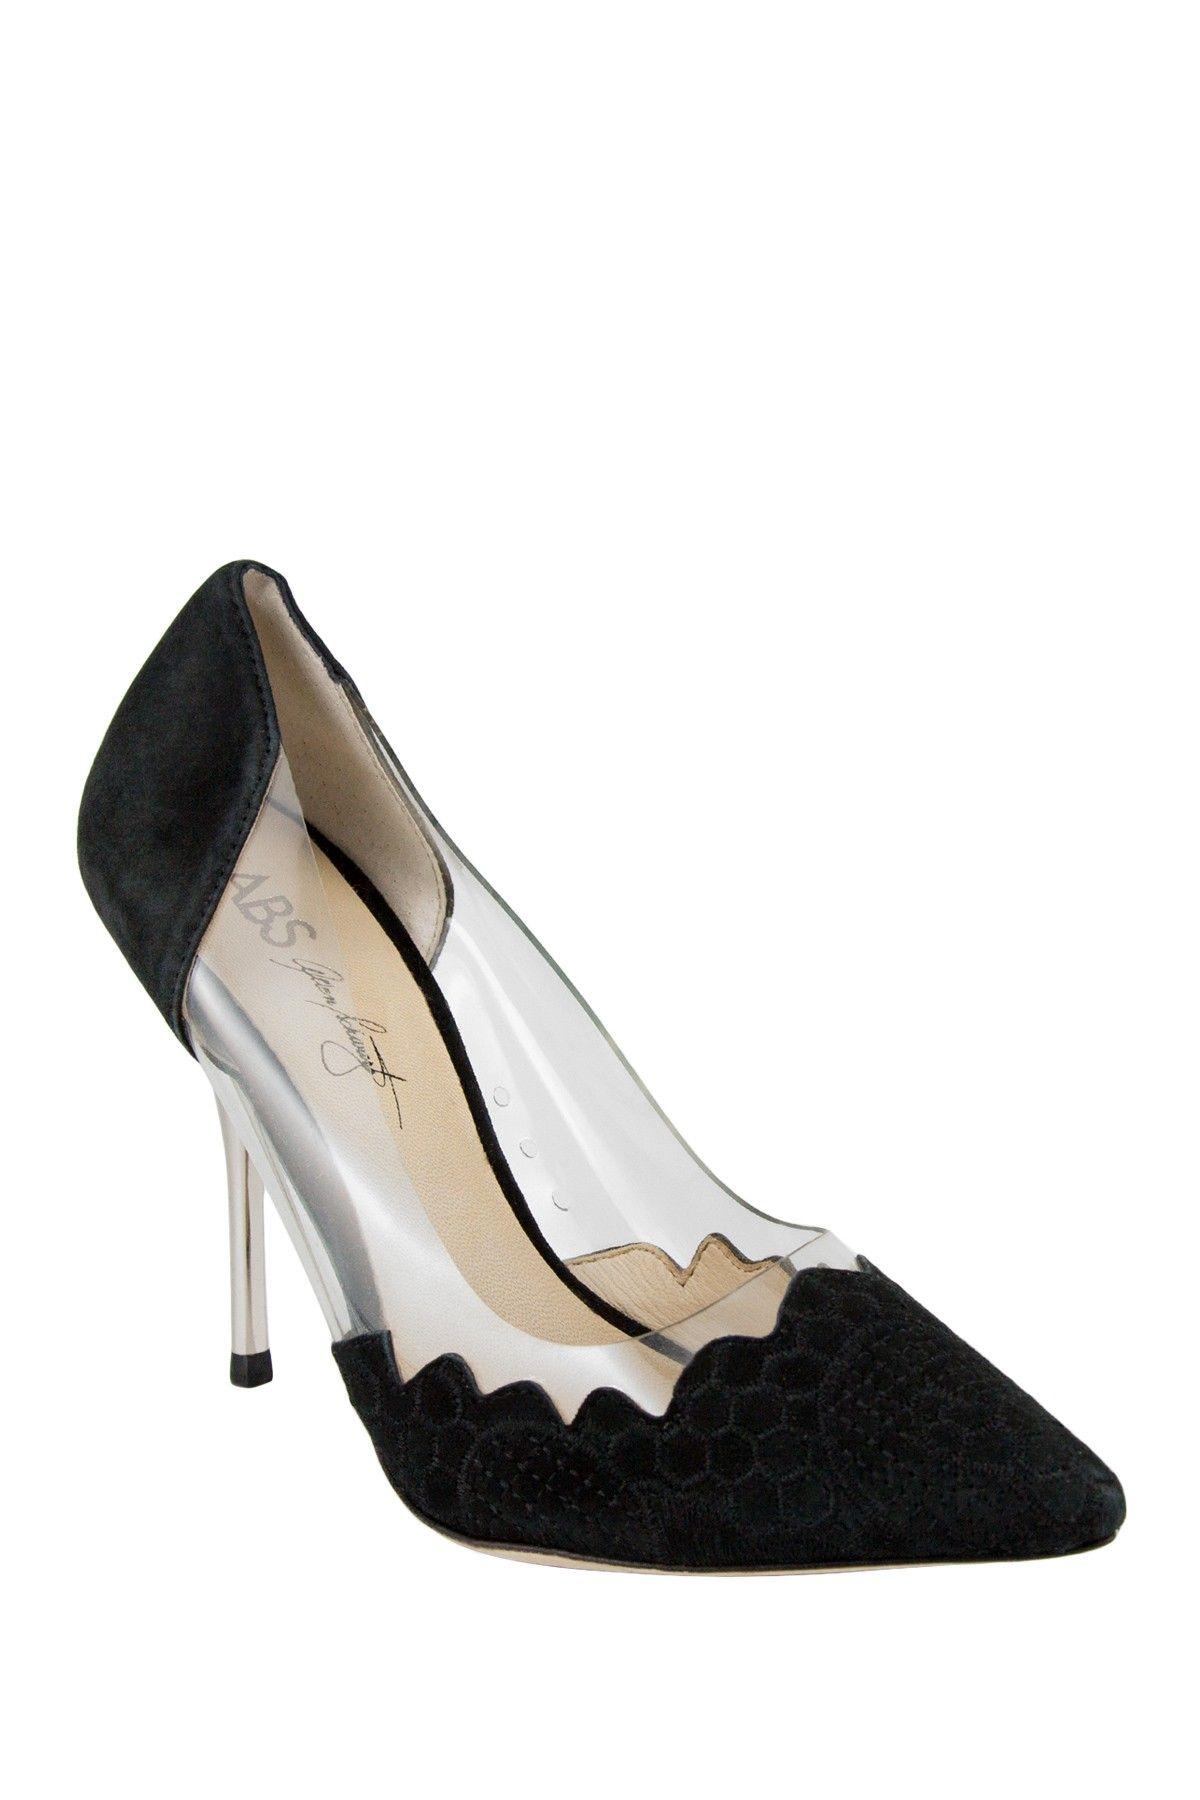 A B S By Allen Schwartz Tiger Lily Stiletto Fancy Shoes Shoes